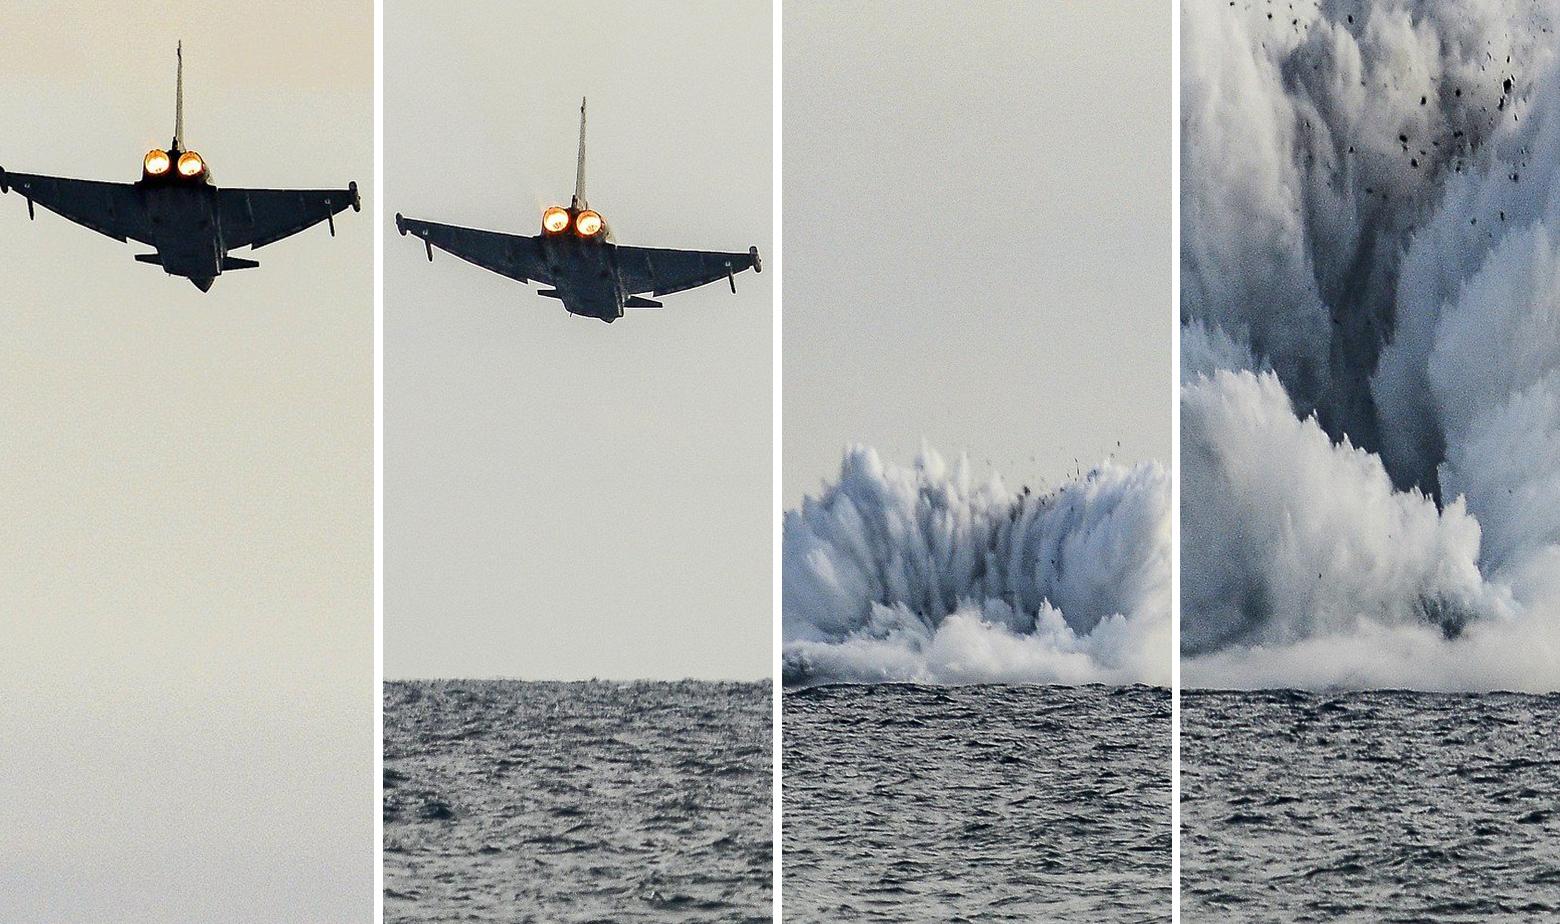 Eurofighter nesreća